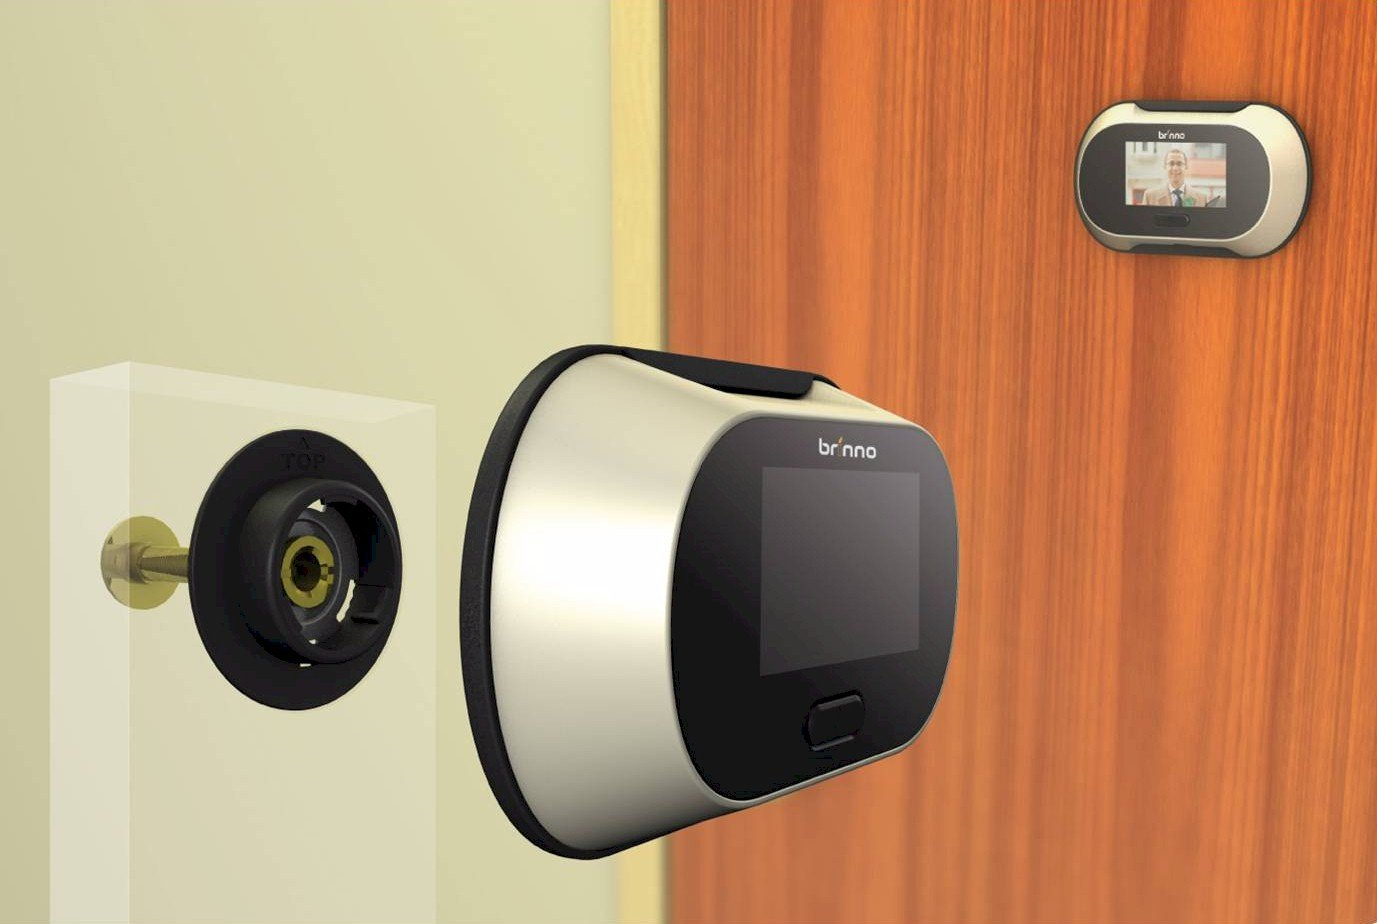 Brinno PHV1325 Digital PeepHole Viewer - Door Viewers - Amazon.com